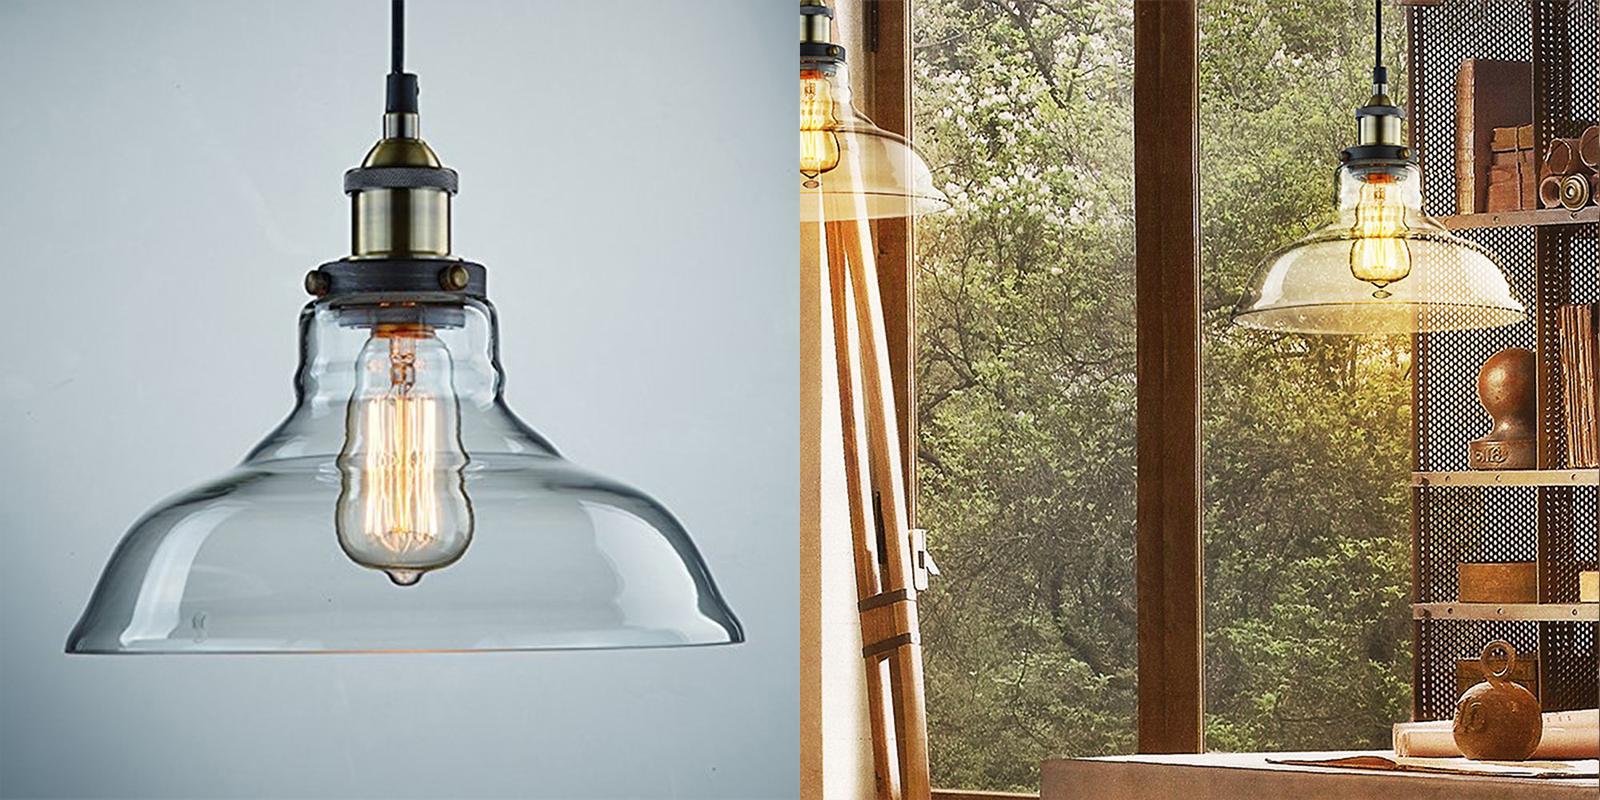 Ecopower Vintage Pendant Glass Shade Light